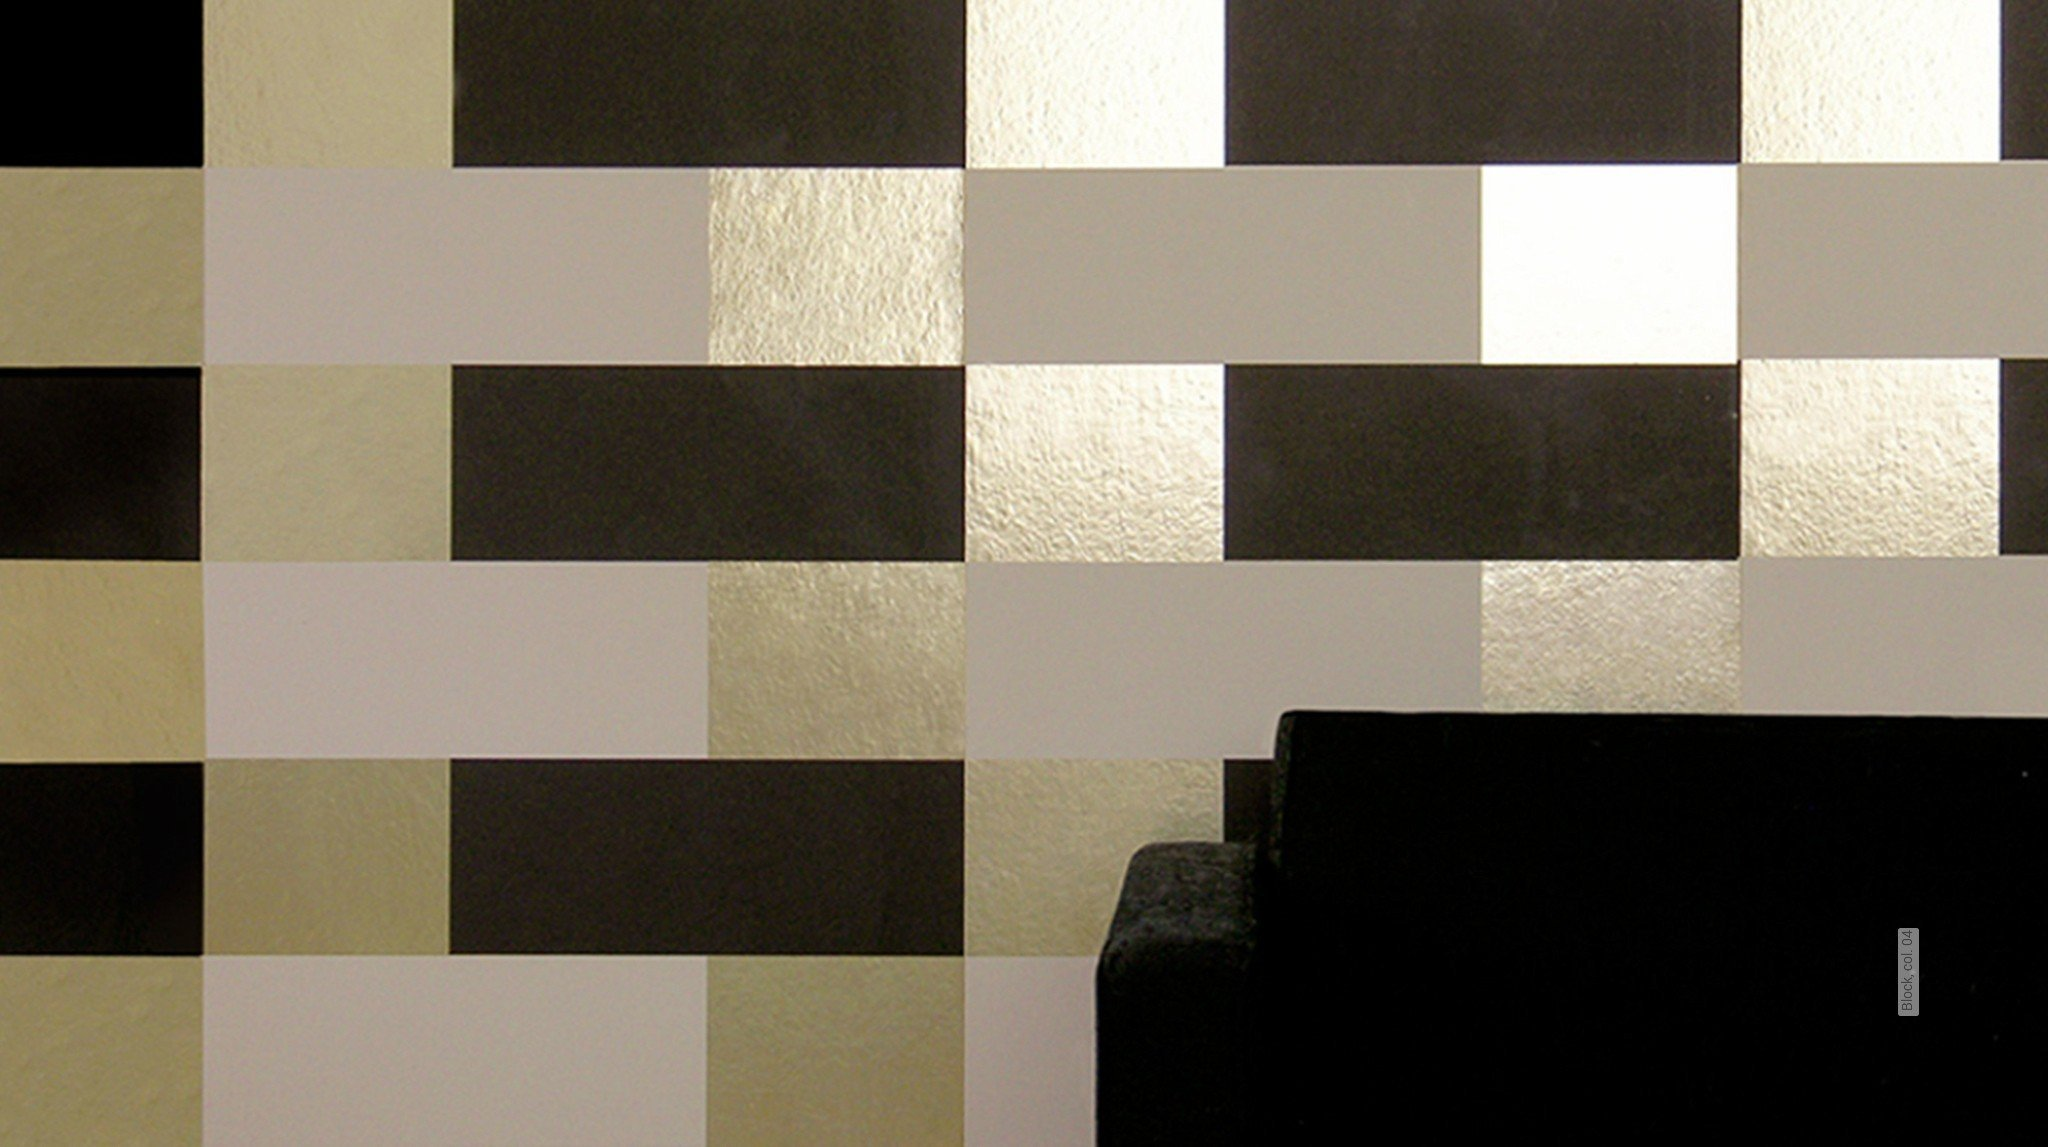 Bauhaus tapeten lust auf was neues for Tapeten bauhaus